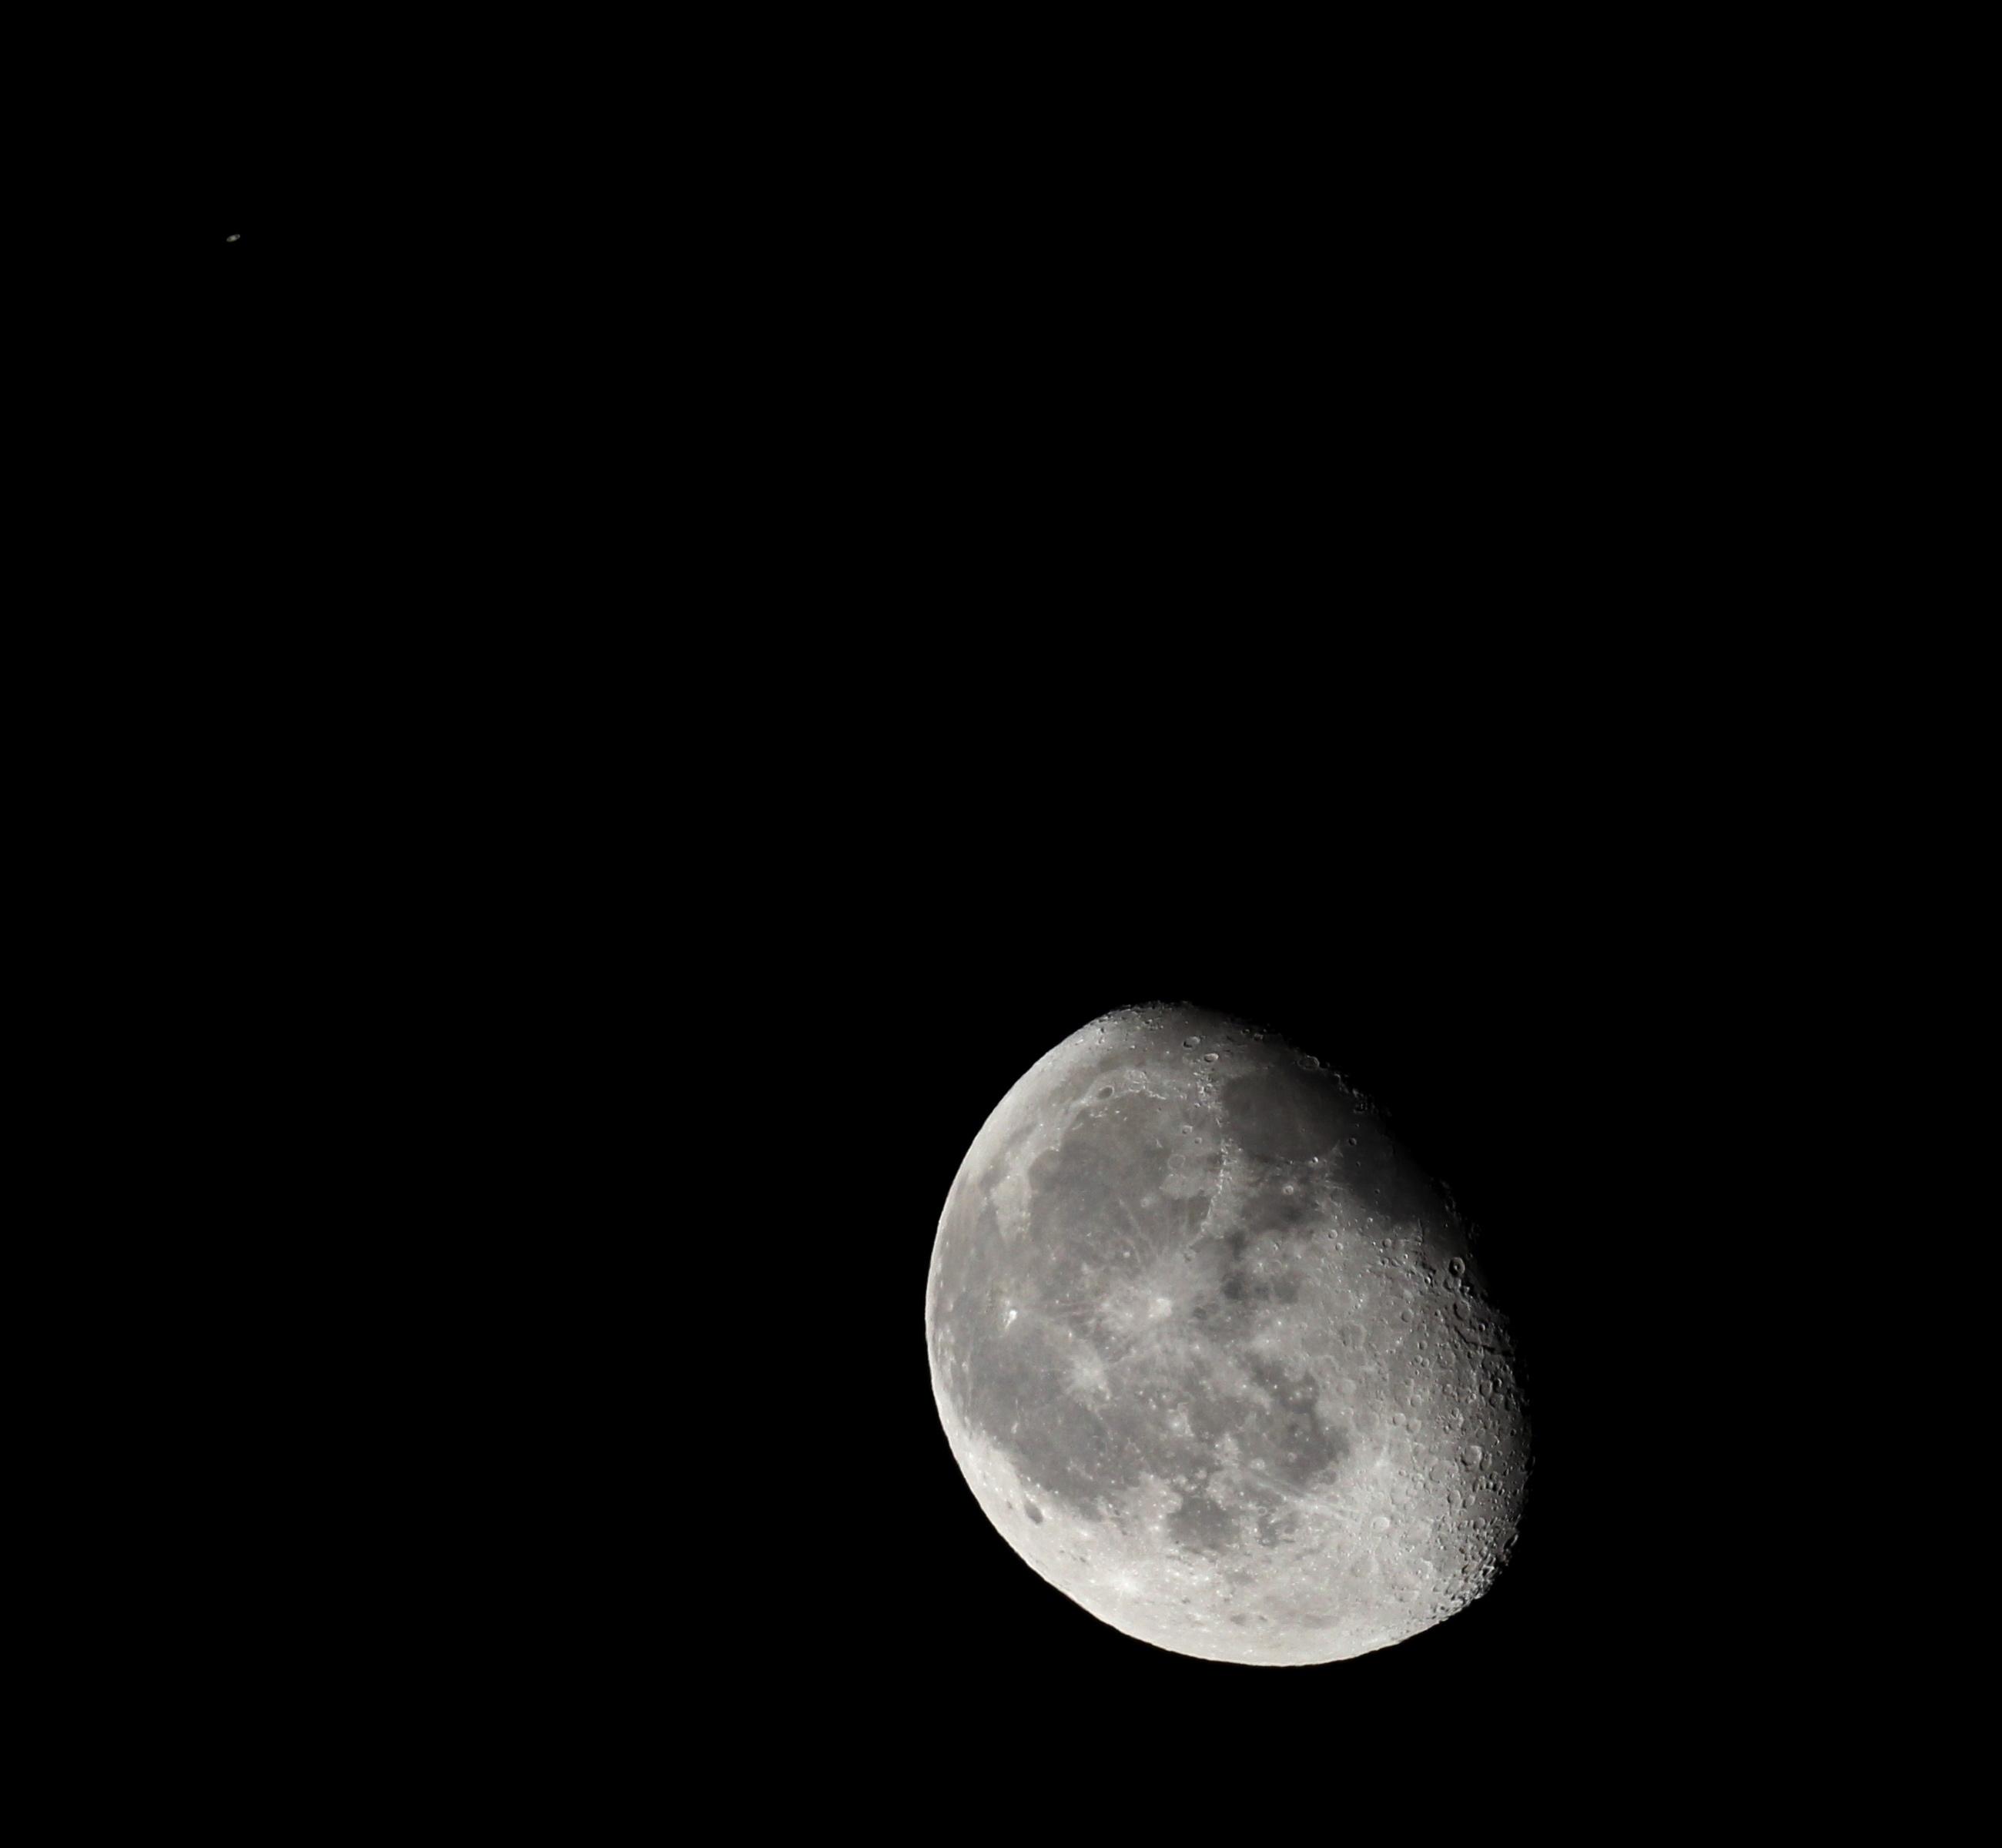 Mond-Saturn-Konjunktion am 21.3.2014, 3:07 MEZ, 65/420 Apochromat, Canon EOS 600D, Kompositaufnahme: ISO 400, 1/80 s und ISO 499, 1/320 s